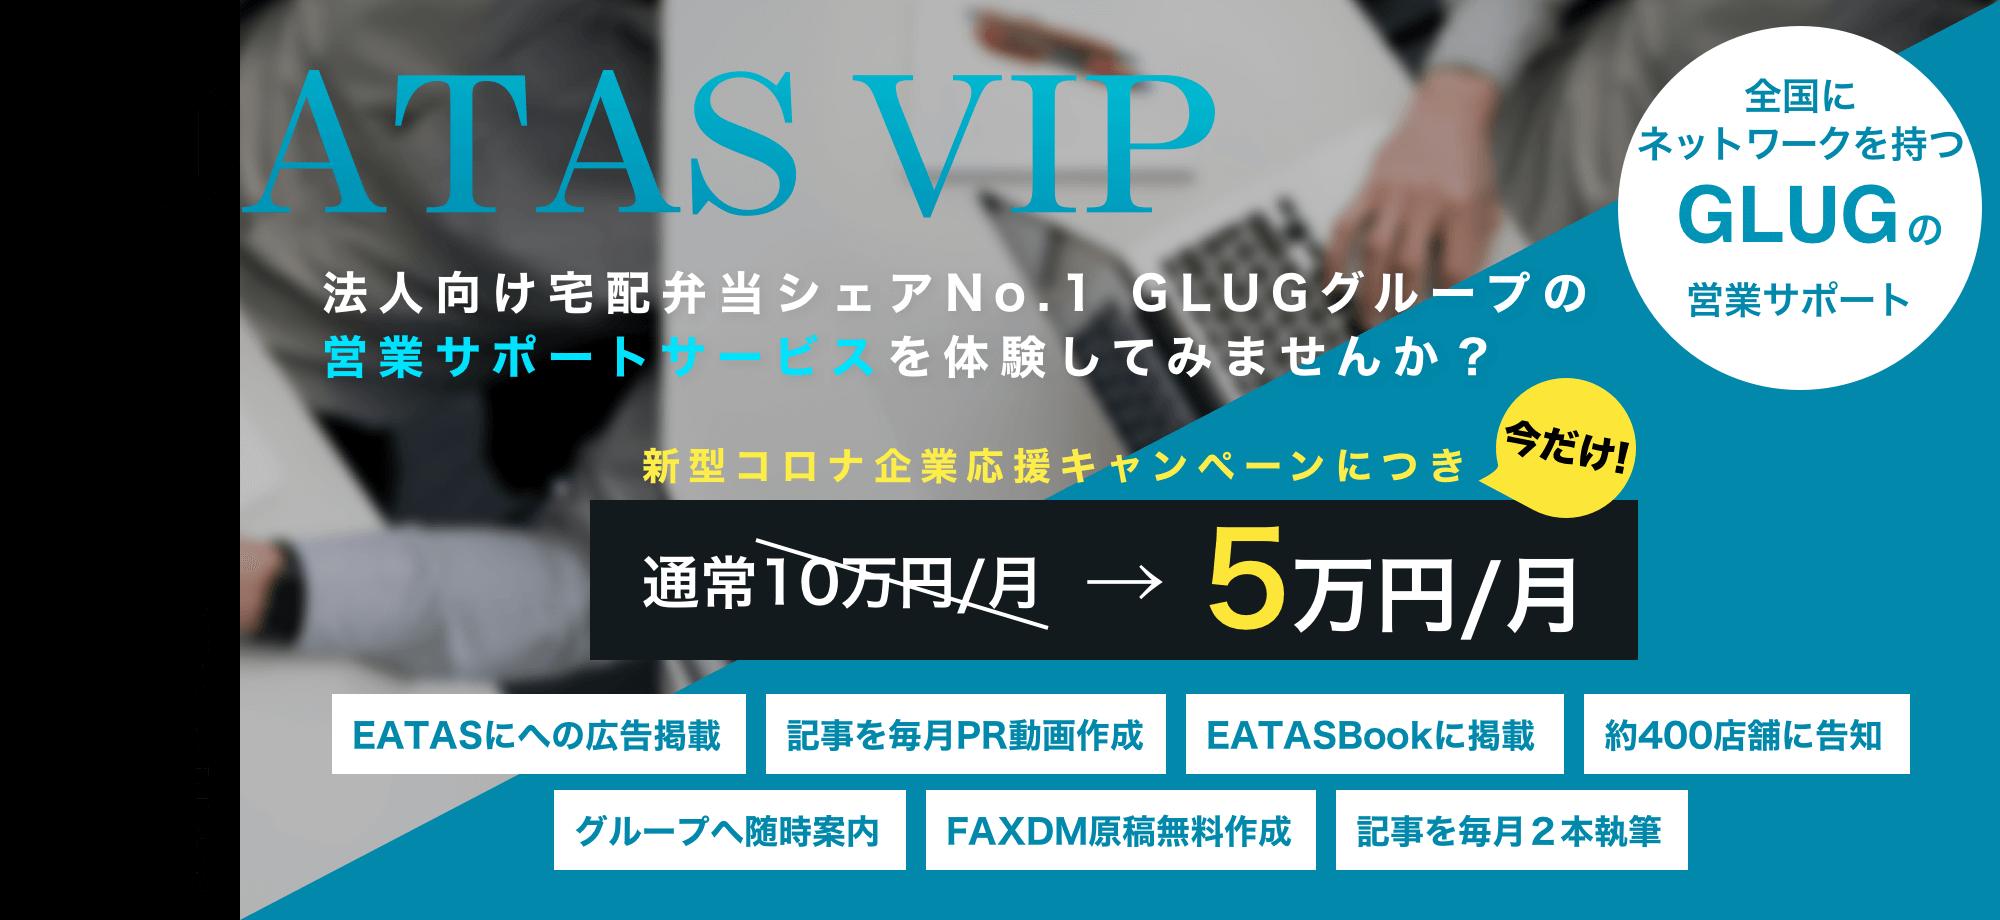 EATAS VIP